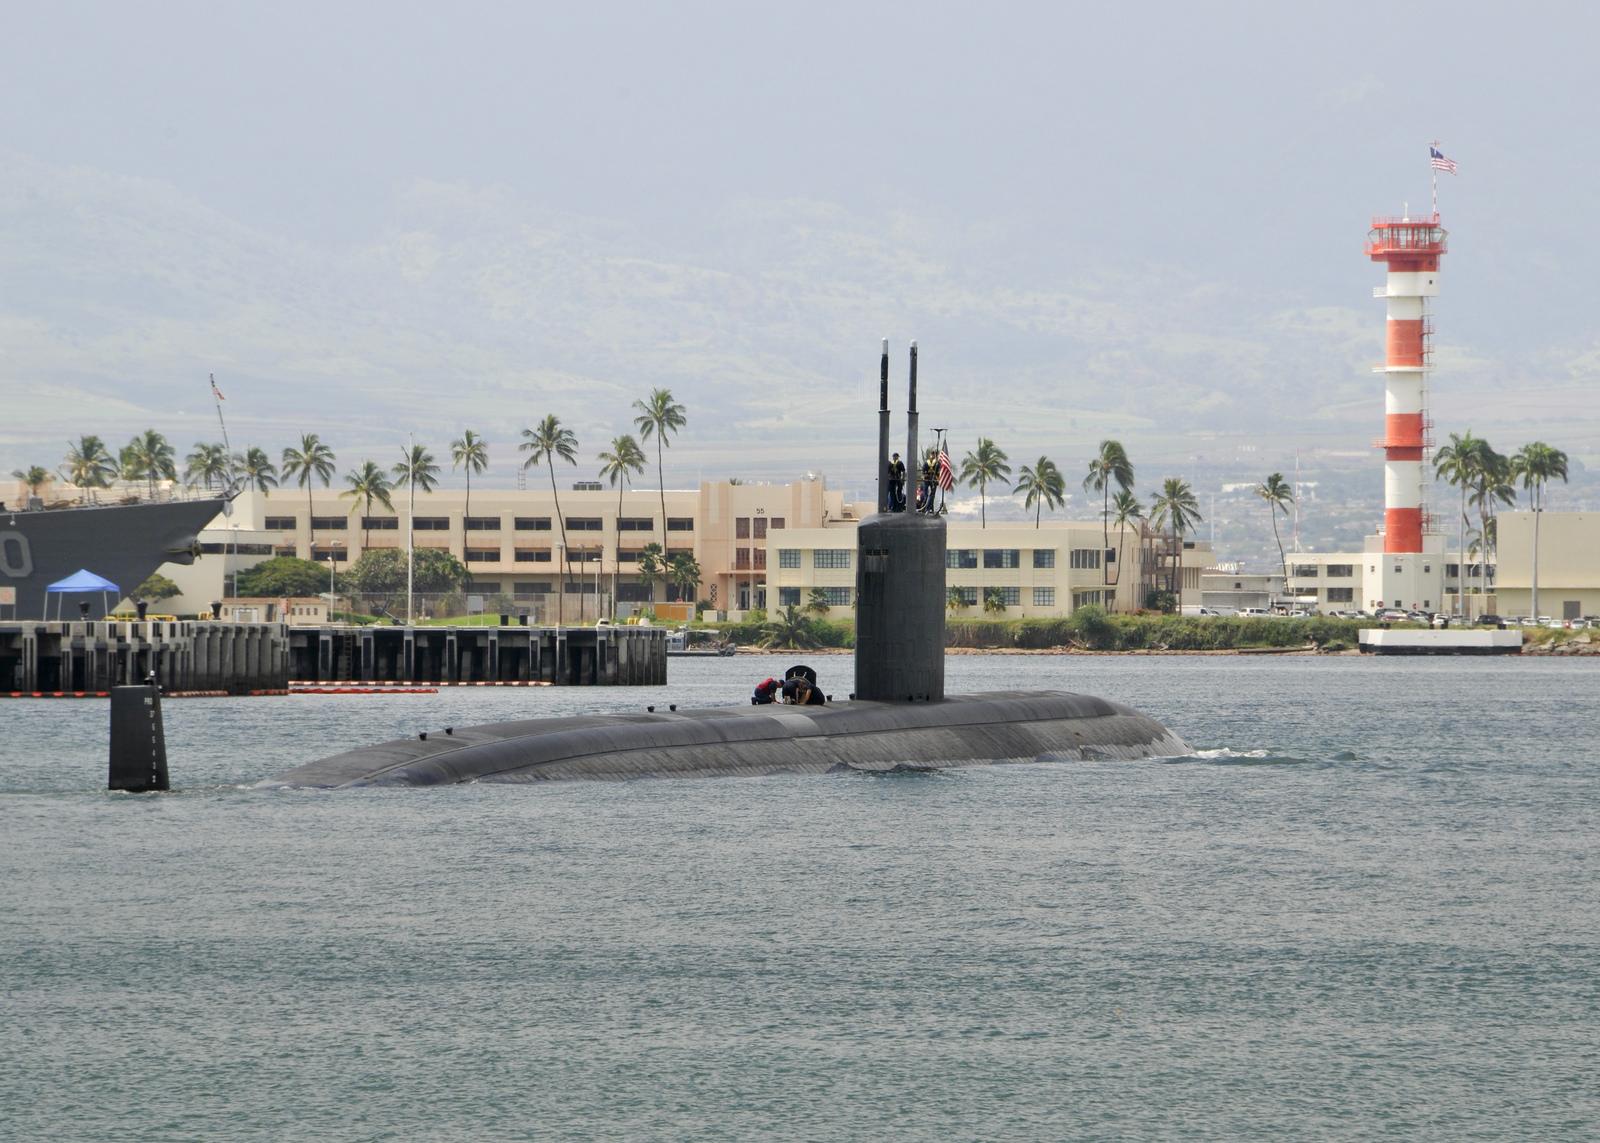 USS COLUMBUS SSN-762 Auslaufen Pearl Harbor am 19.02.2014 Bild: U.S. Navy